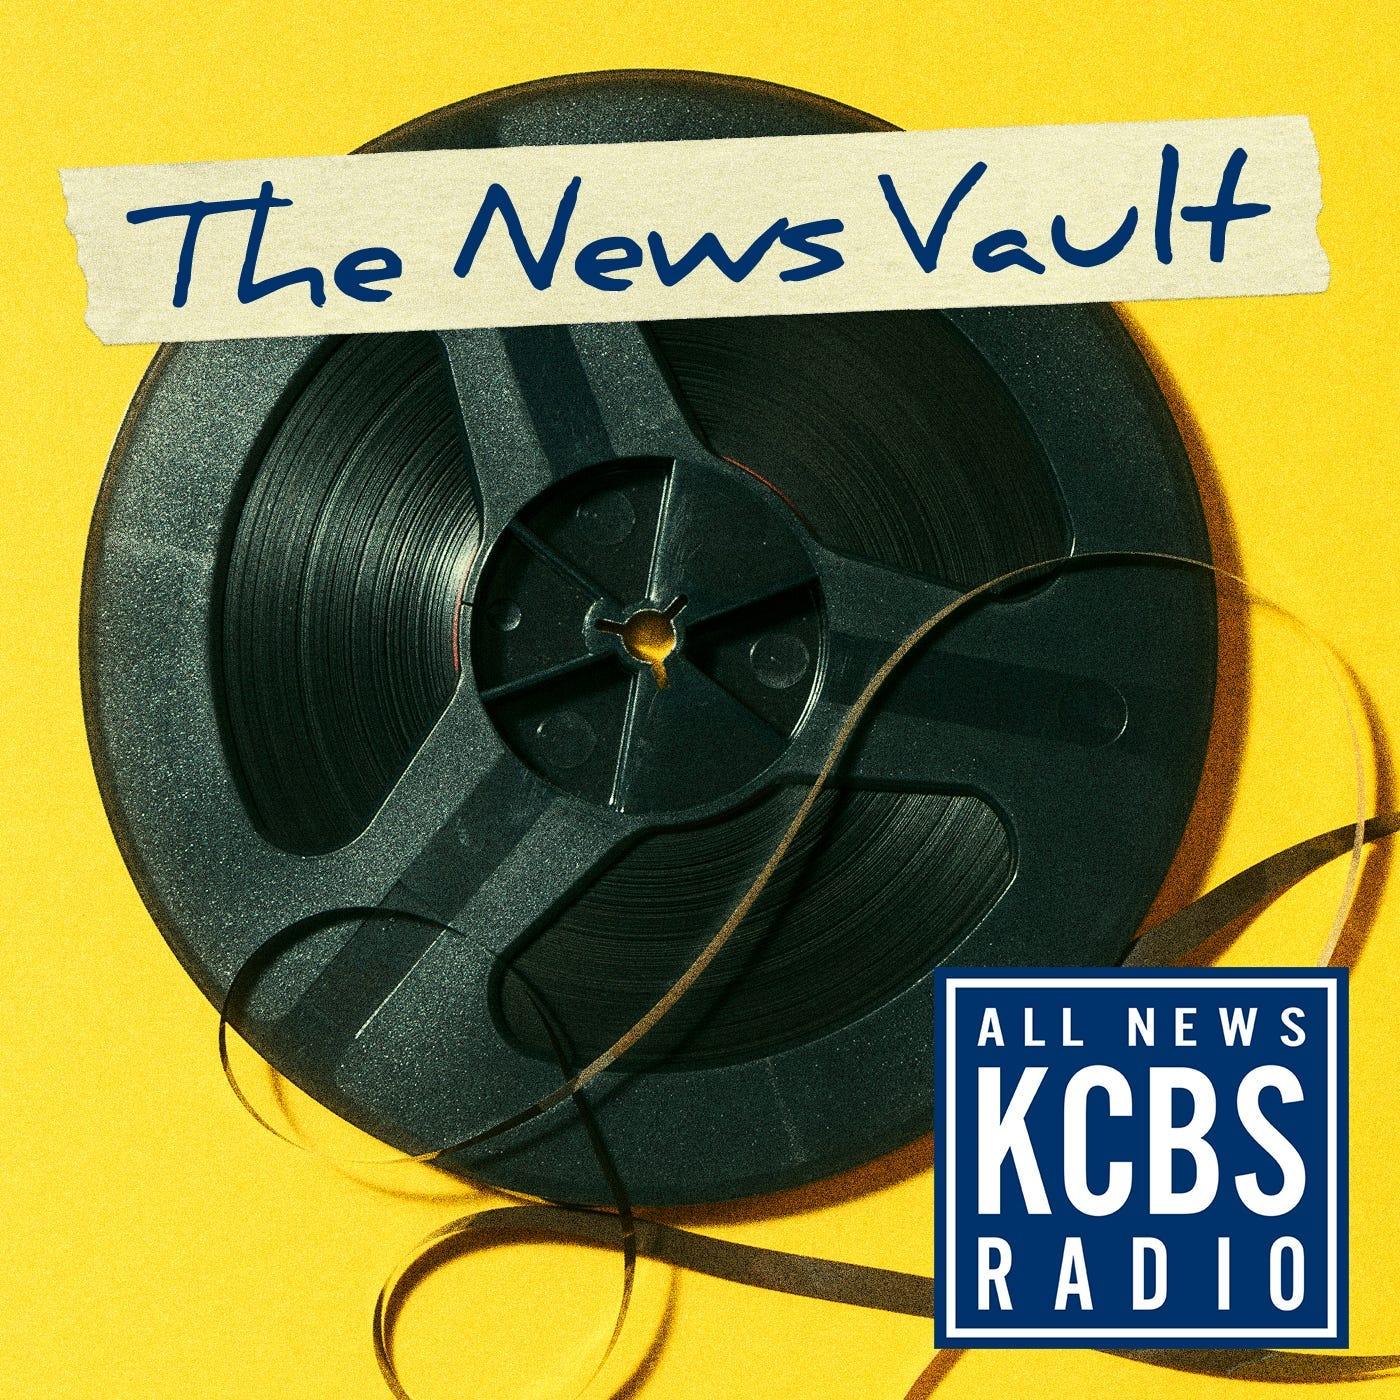 The News Vault from KCBS Radio